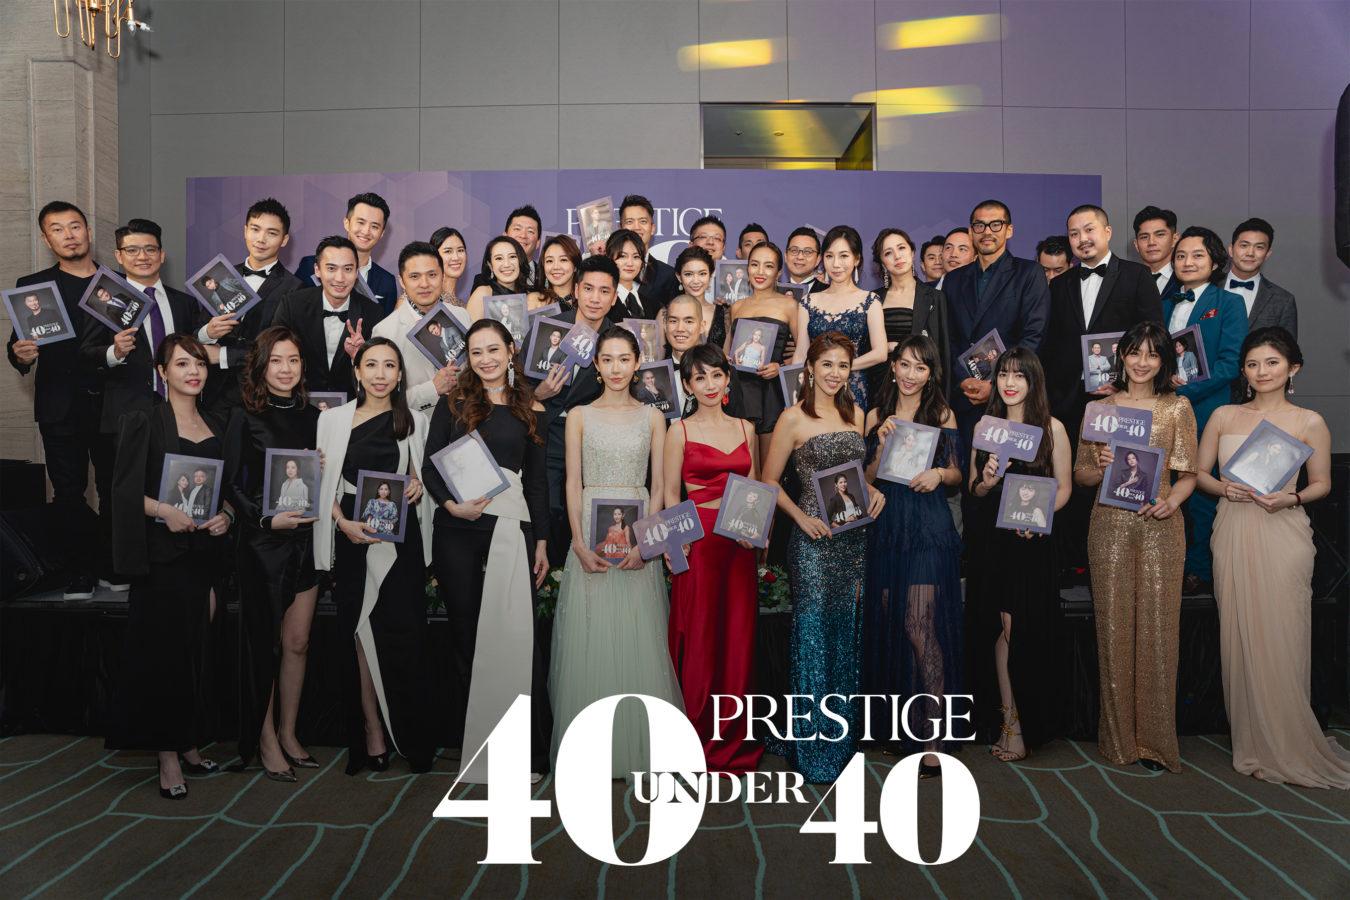 2020 PRESTIGE《40 UNDER 40》年度盛會活動集錦